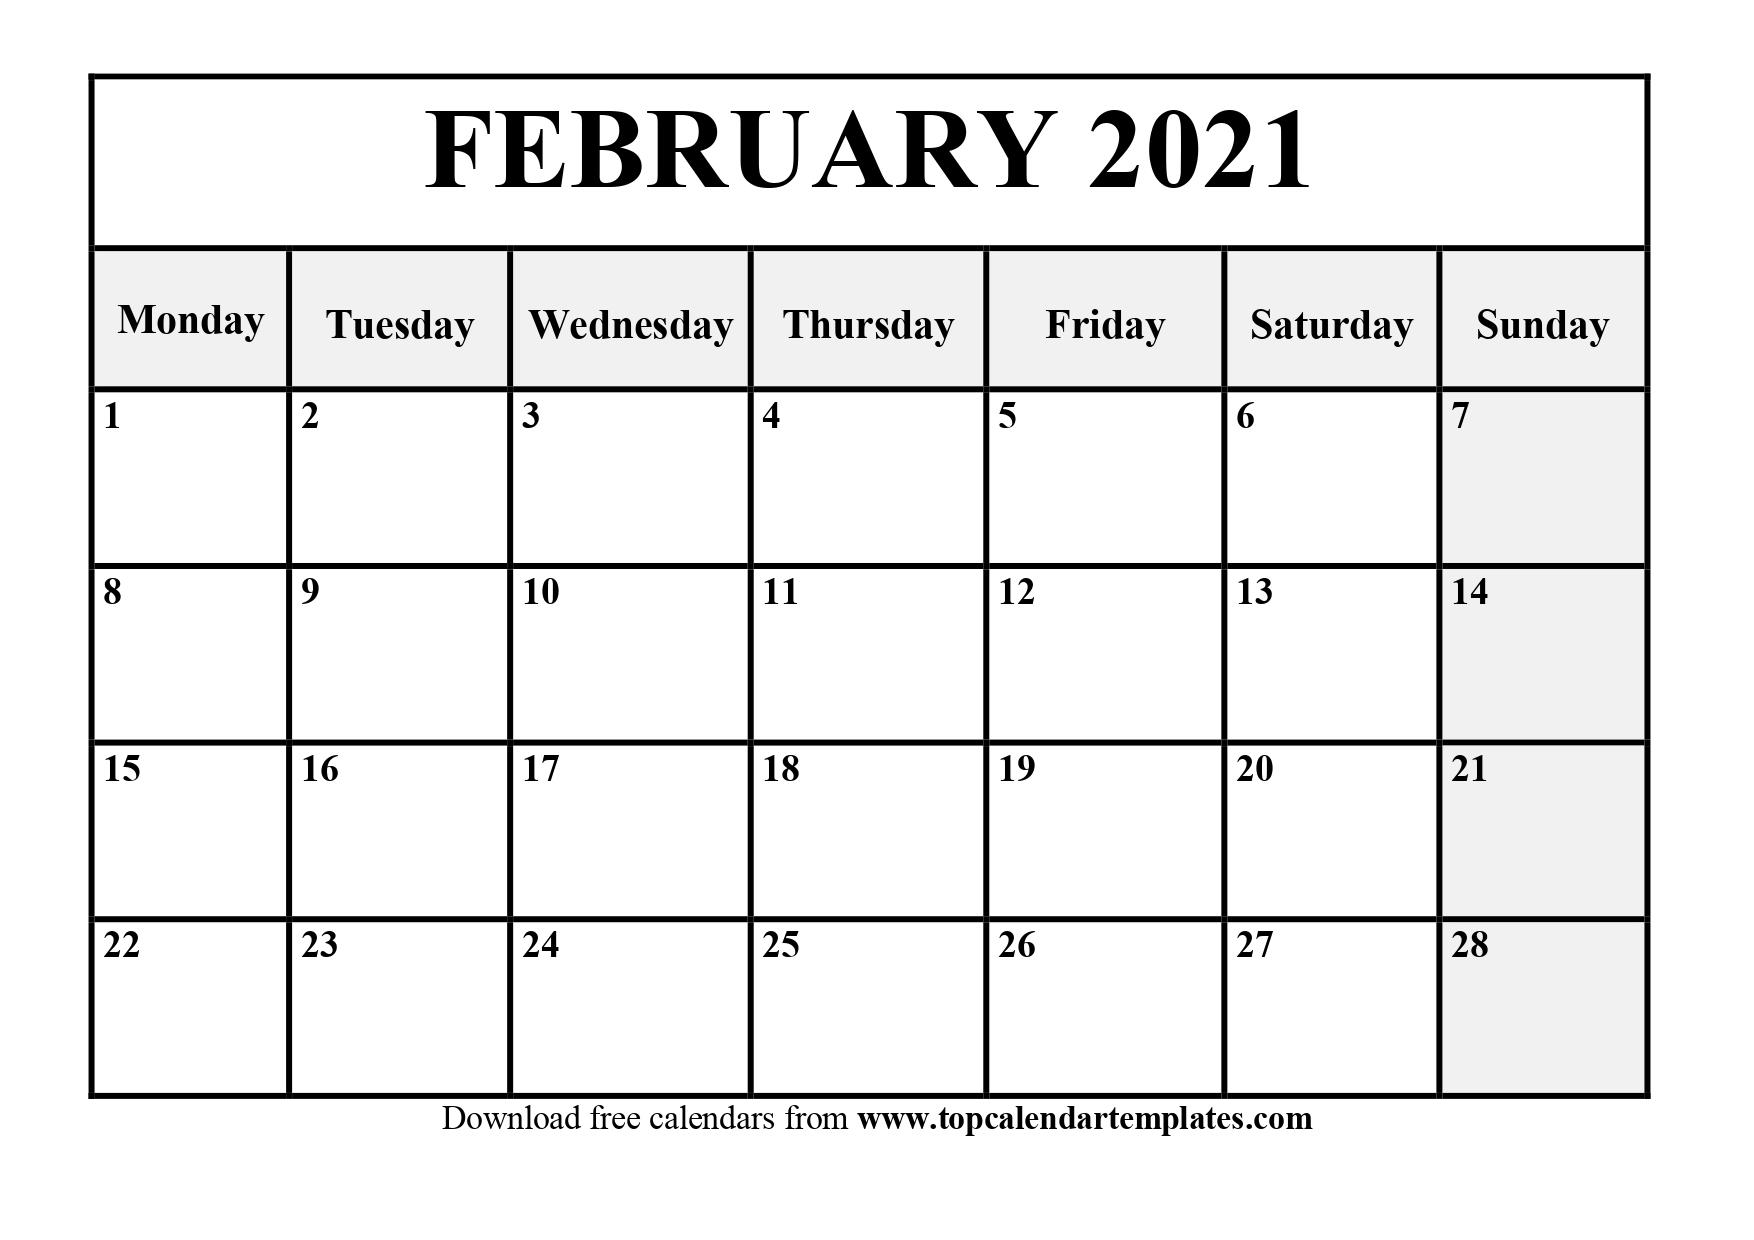 February 2021 Printable Calendar Template - Pdf, Word, Excel